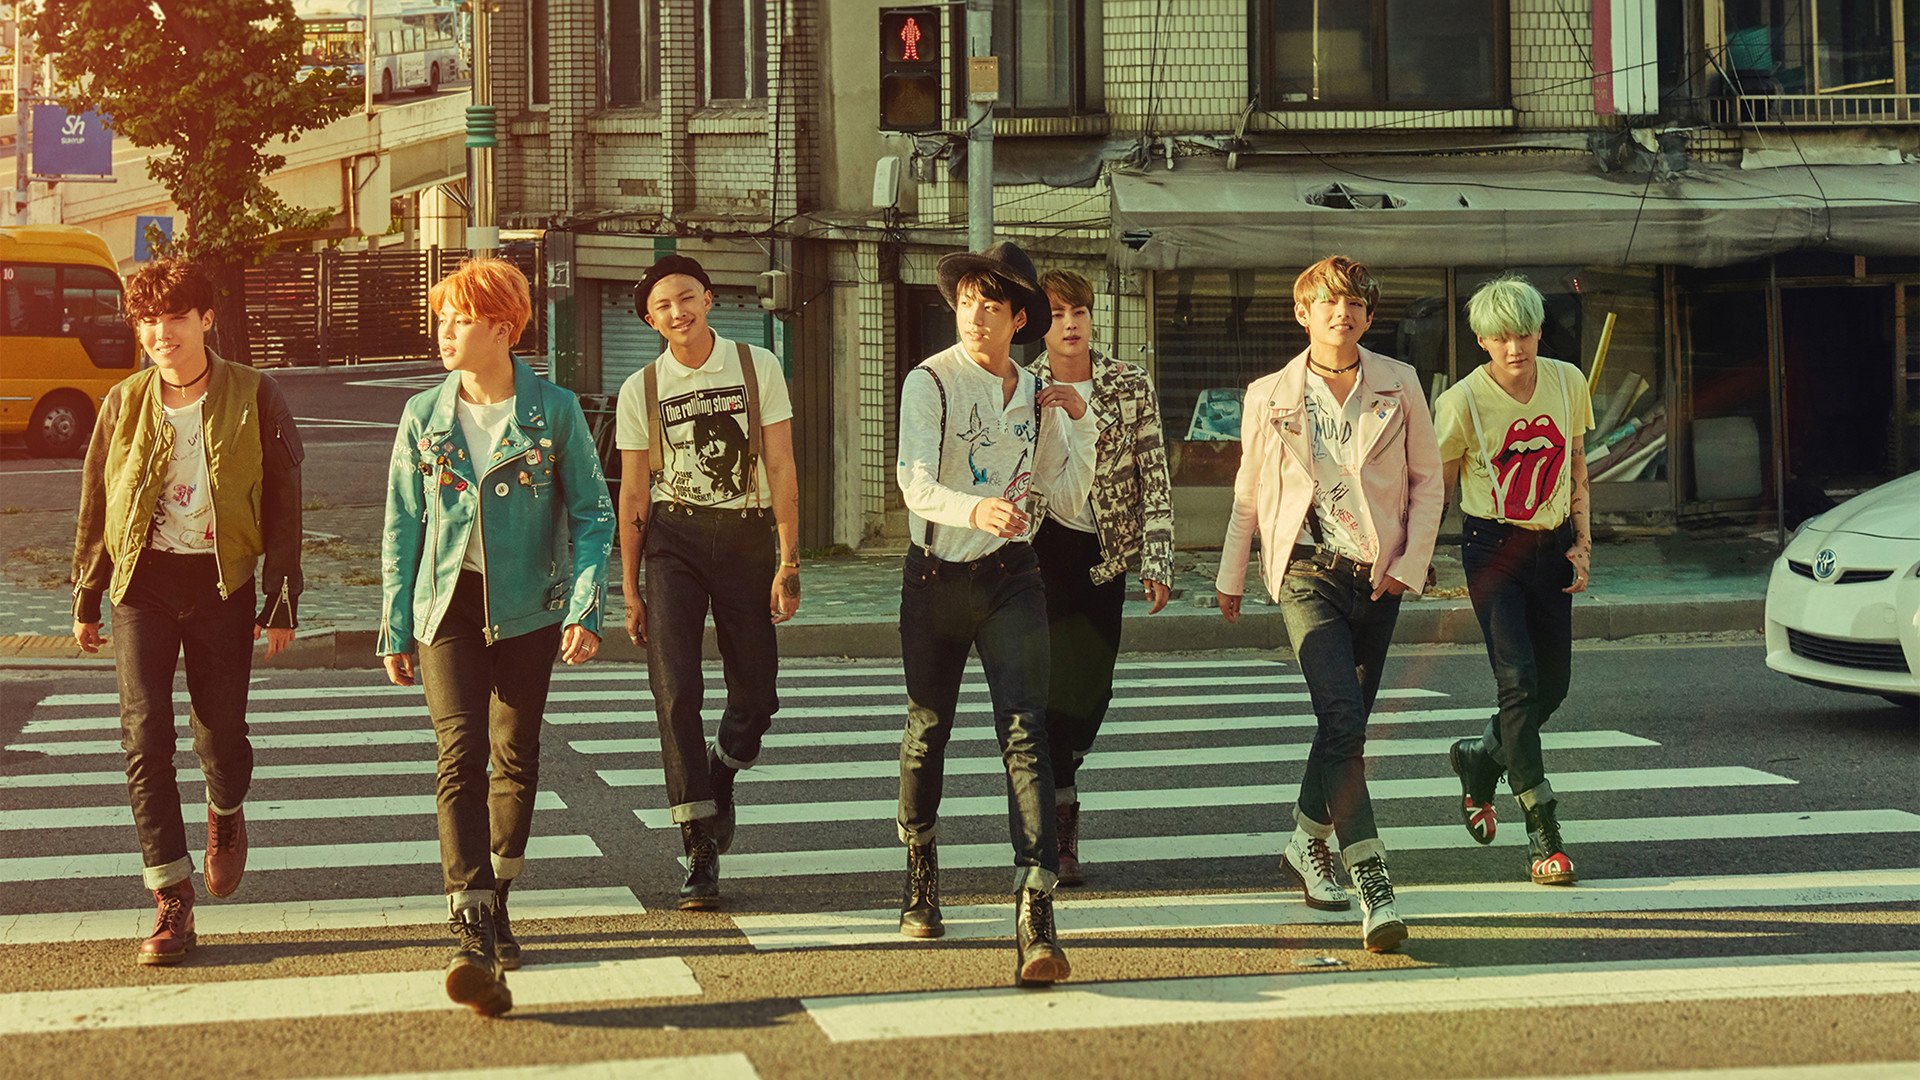 Wallpaper / BTS 방탄소년단 防弾少年団